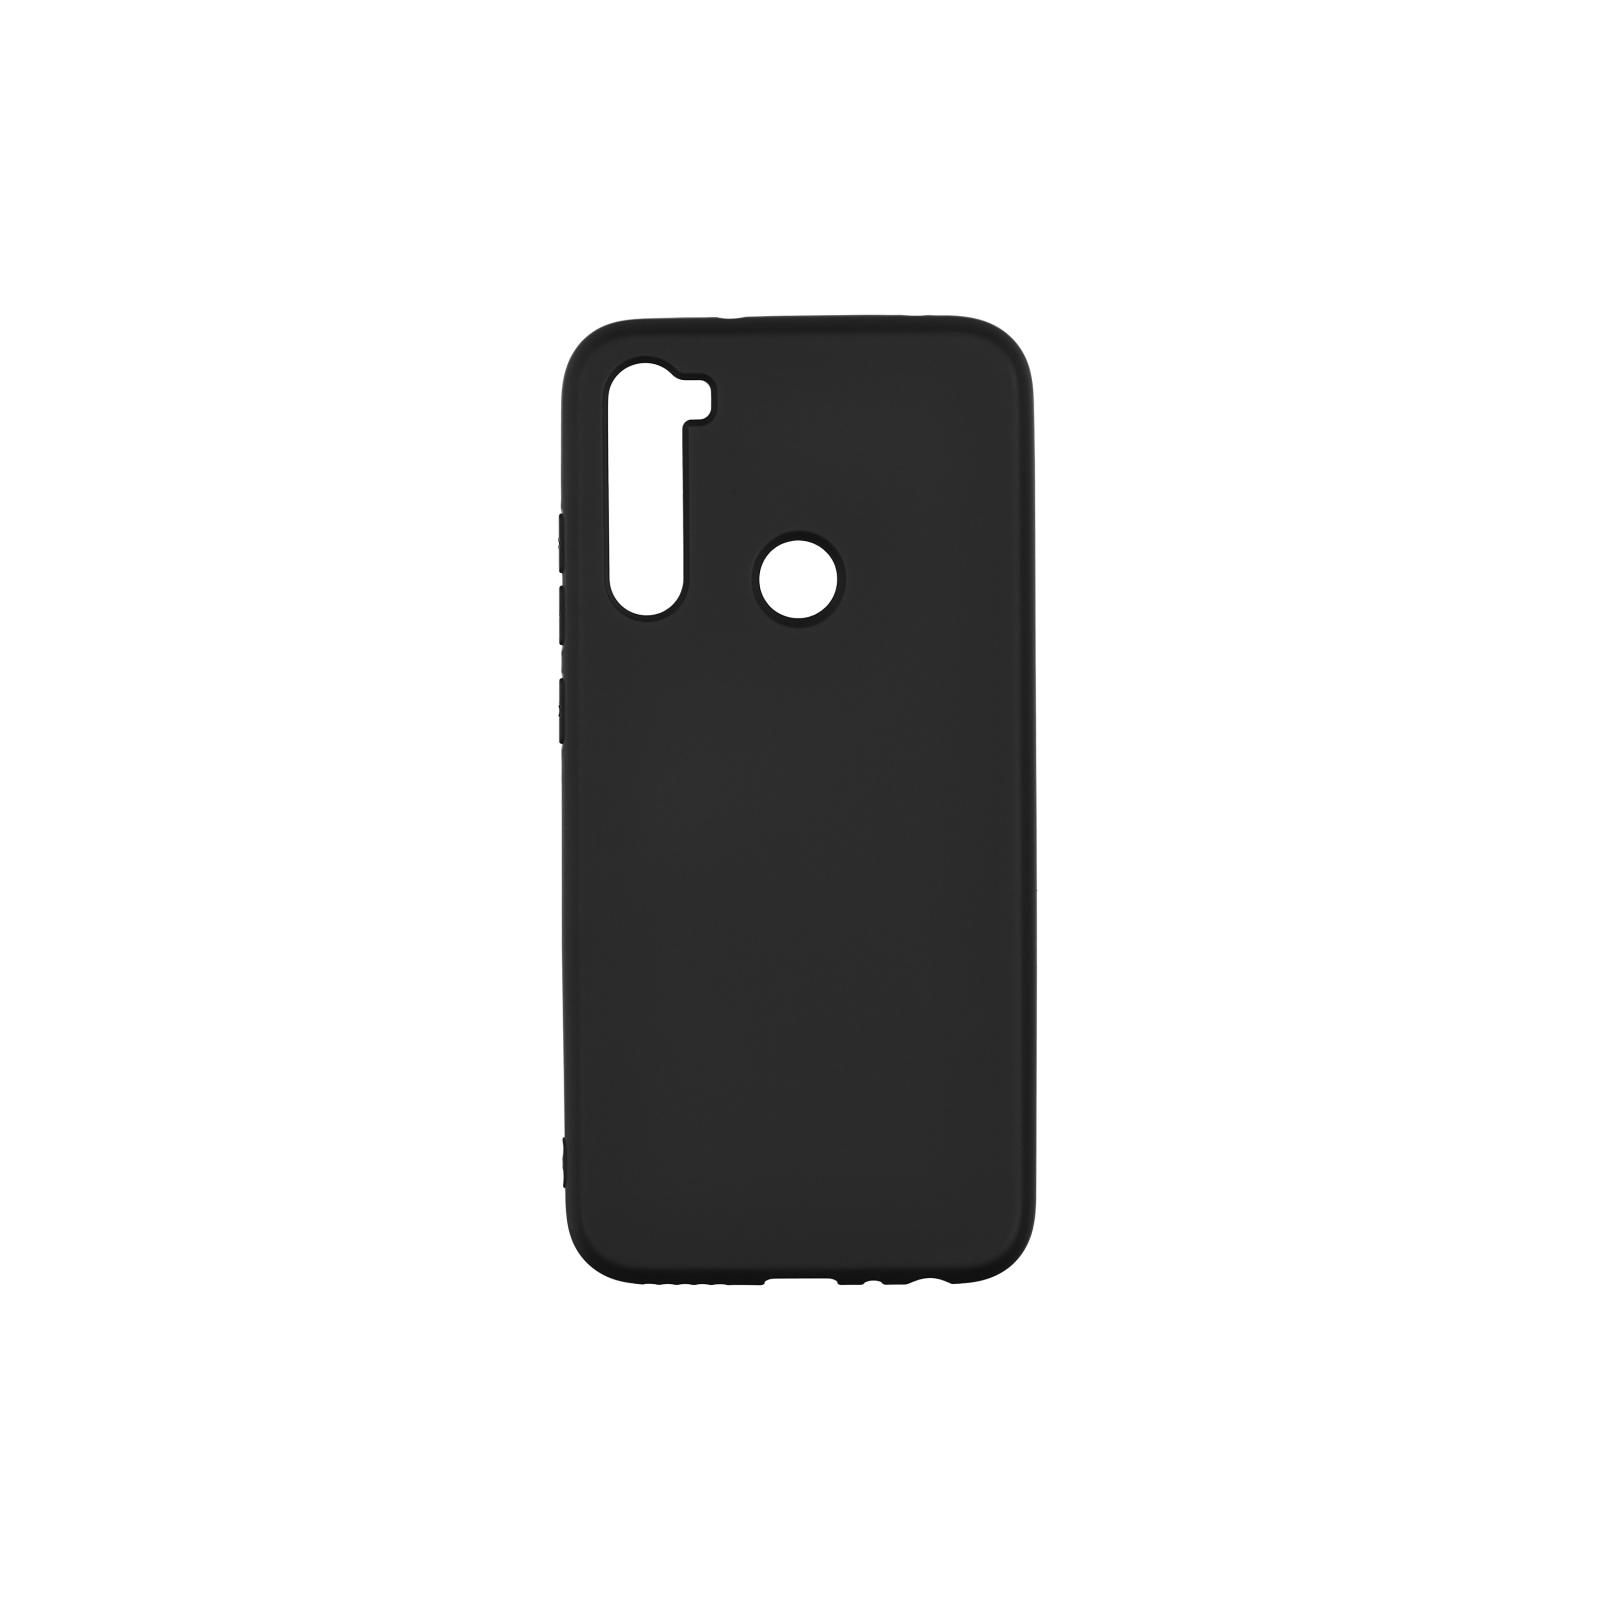 Чехол для моб. телефона 2E Xiaomi Redmi Note 8, Soft feeling, Black (2E-MI-N8-NKSF-BK)